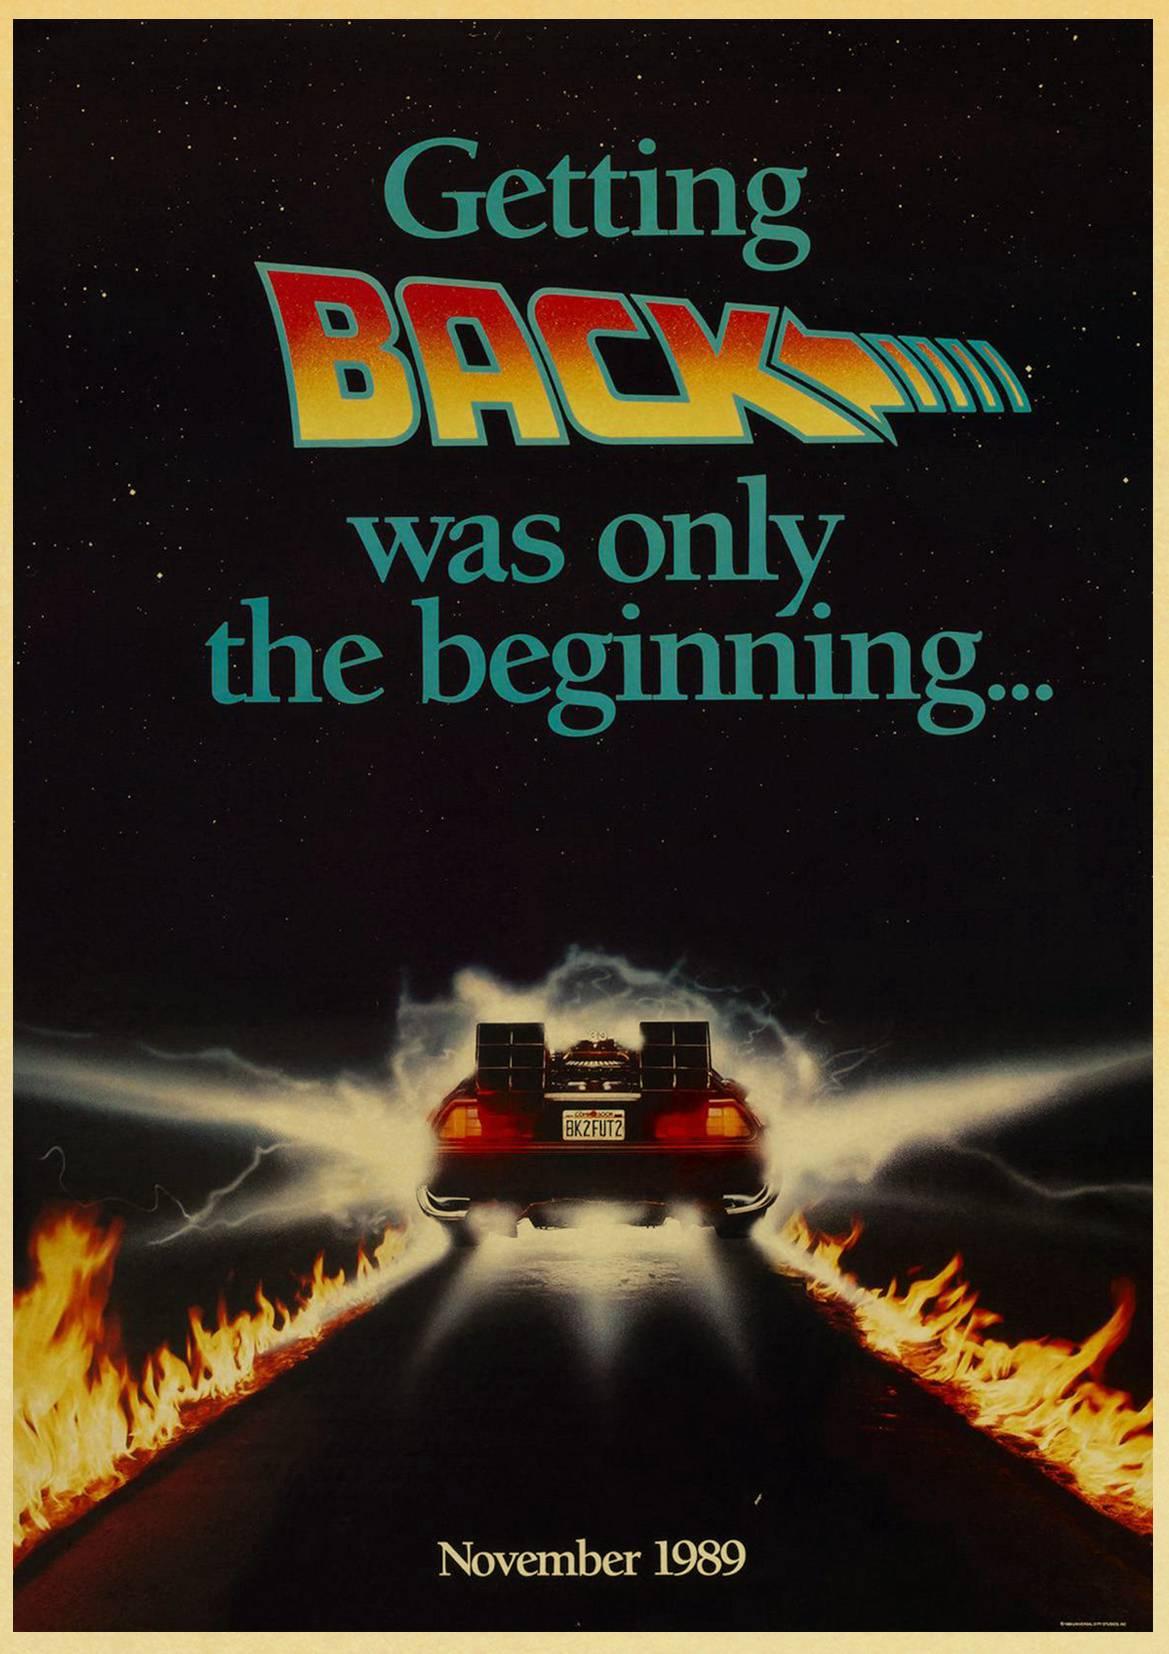 HTB1EVUVlnlYBeNjSszcq6zwhFXaS Sci-fi Back to The Future Film Propaganda Retro Kraft Poster Decorative DIY Wall Canvas Sticker Home Bar Art Posters Decor